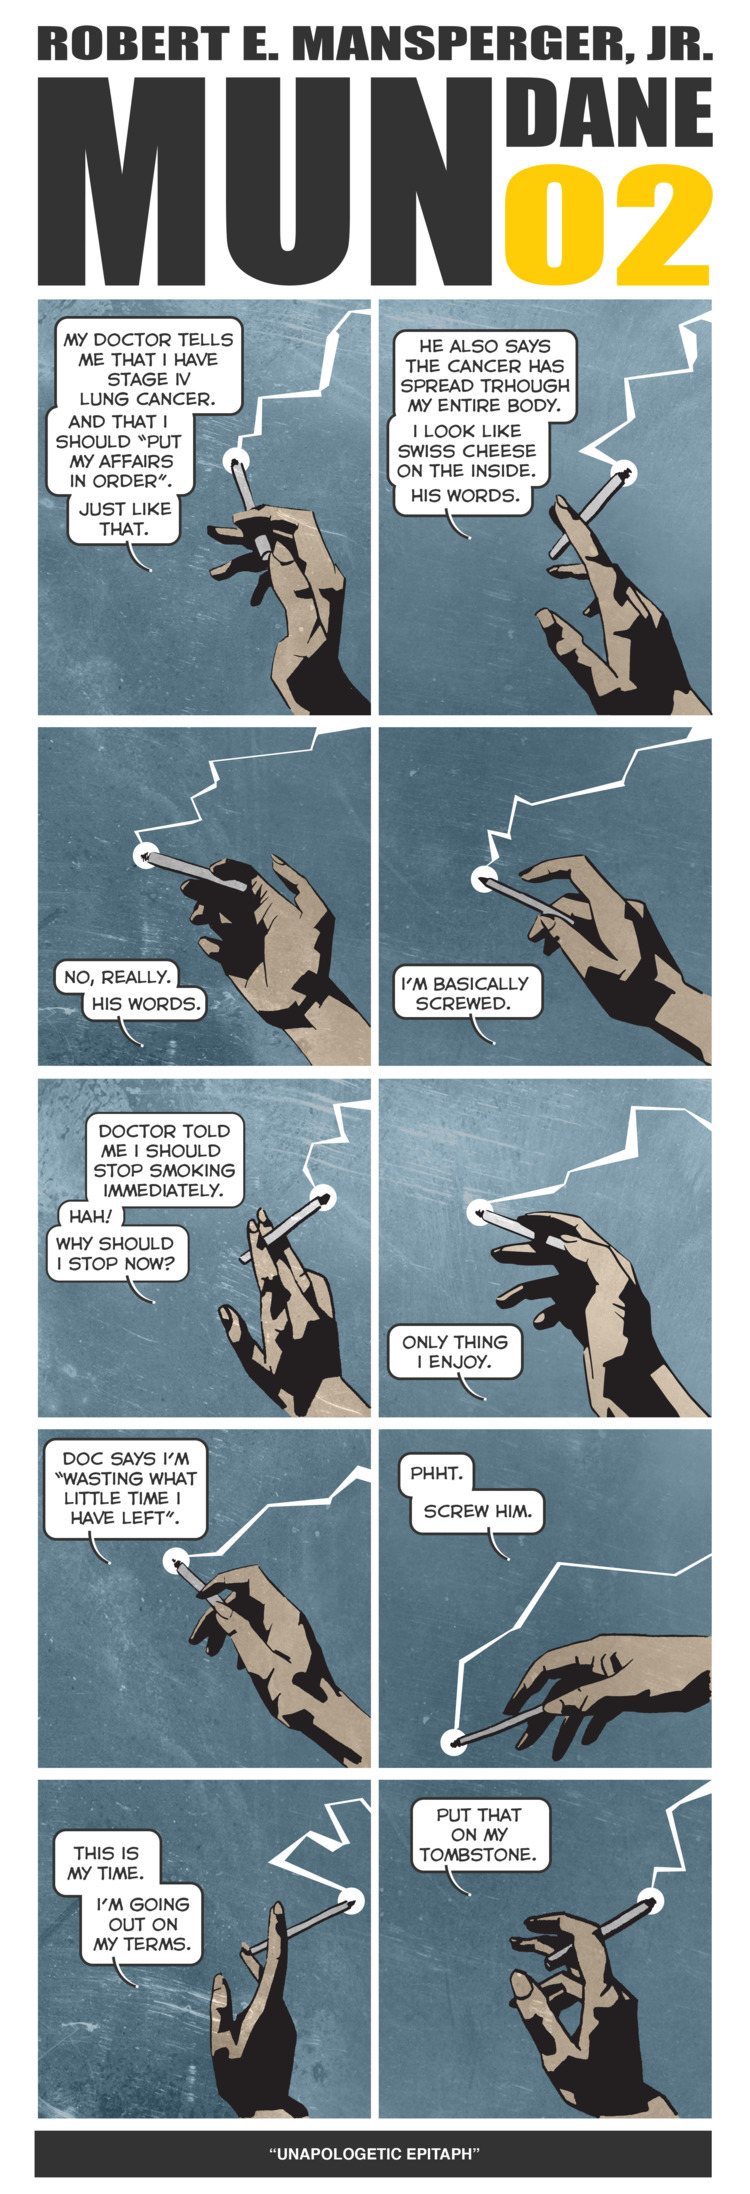 MUNDANE 02 comic strip - rmansperger   ello